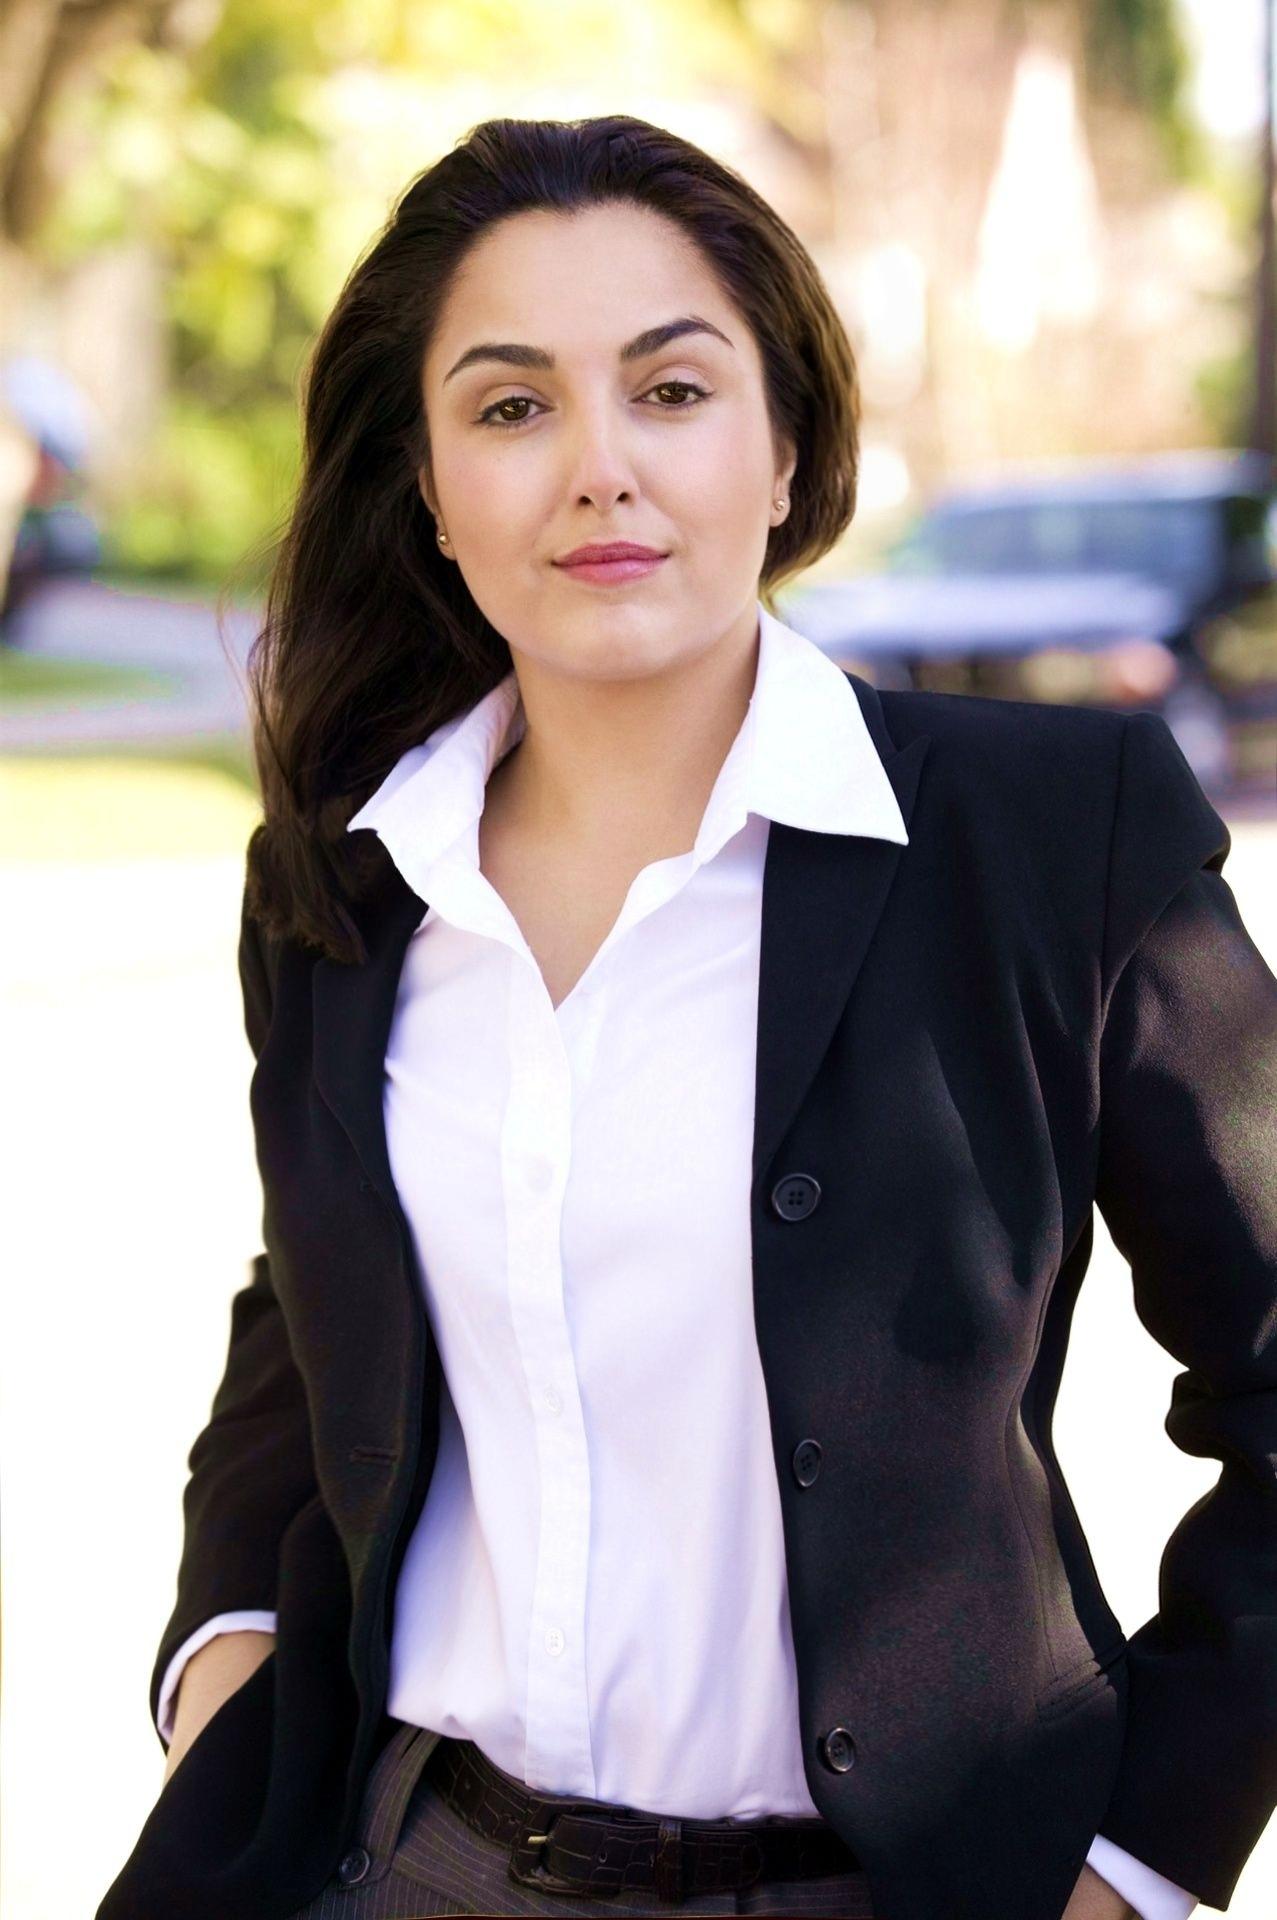 Nicole Kian Sadighi - Pix 3